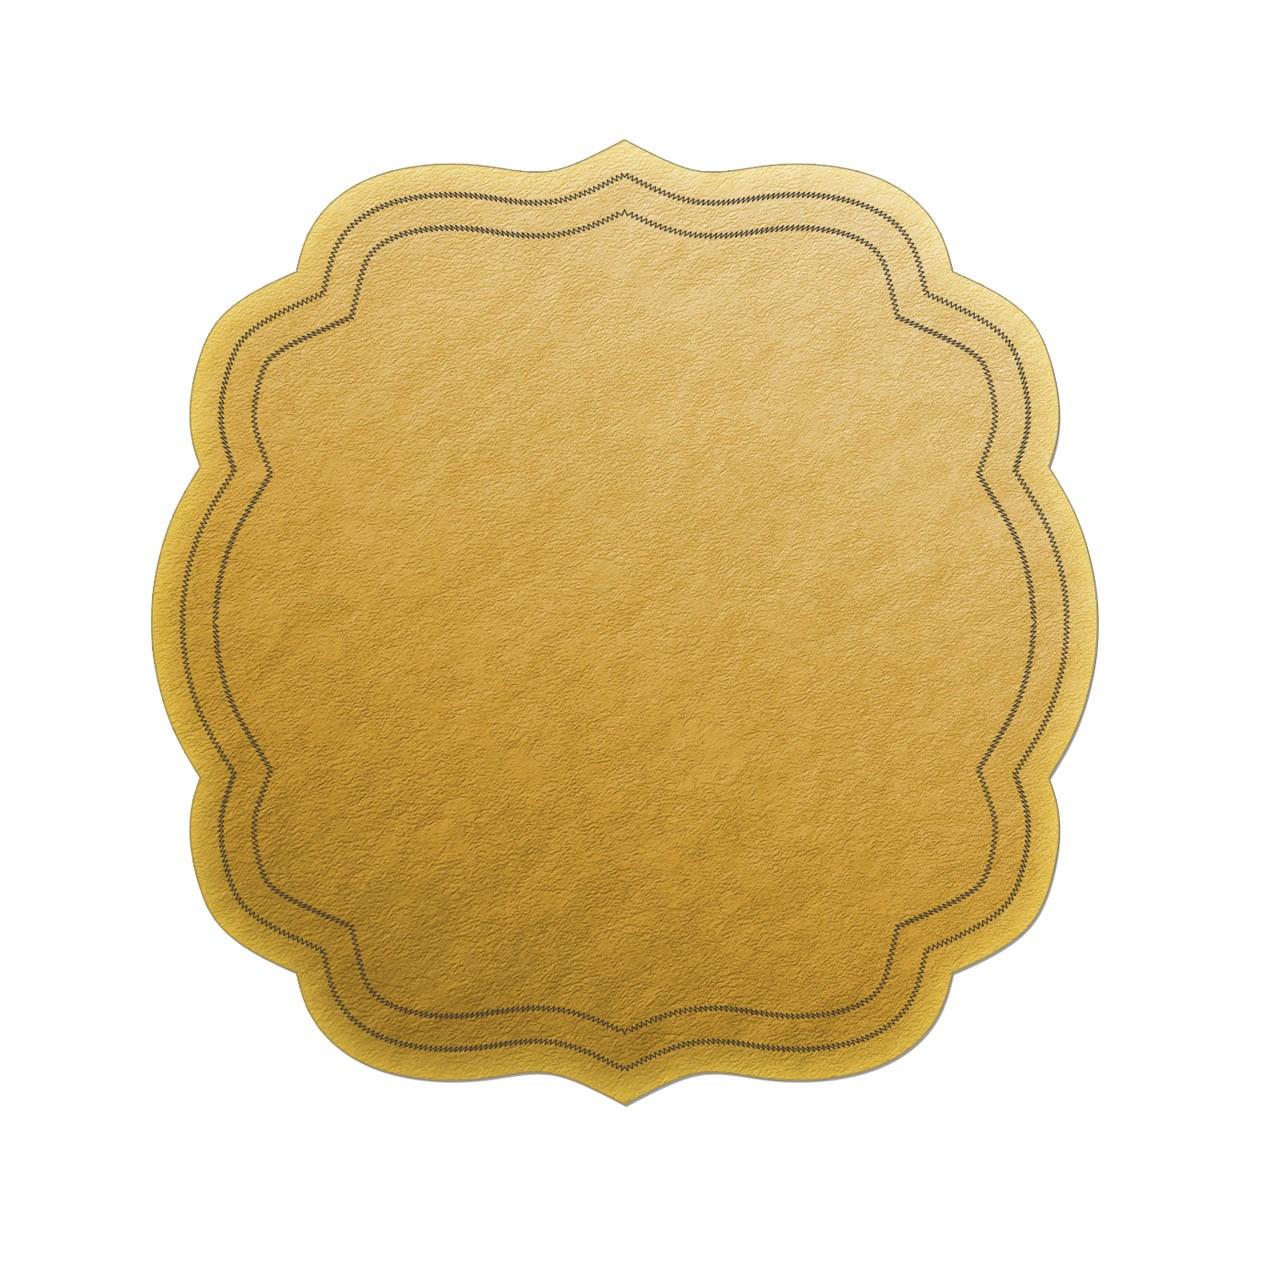 زیر بشقابی چرمی رومادون کد109 - بسته 6 عددی